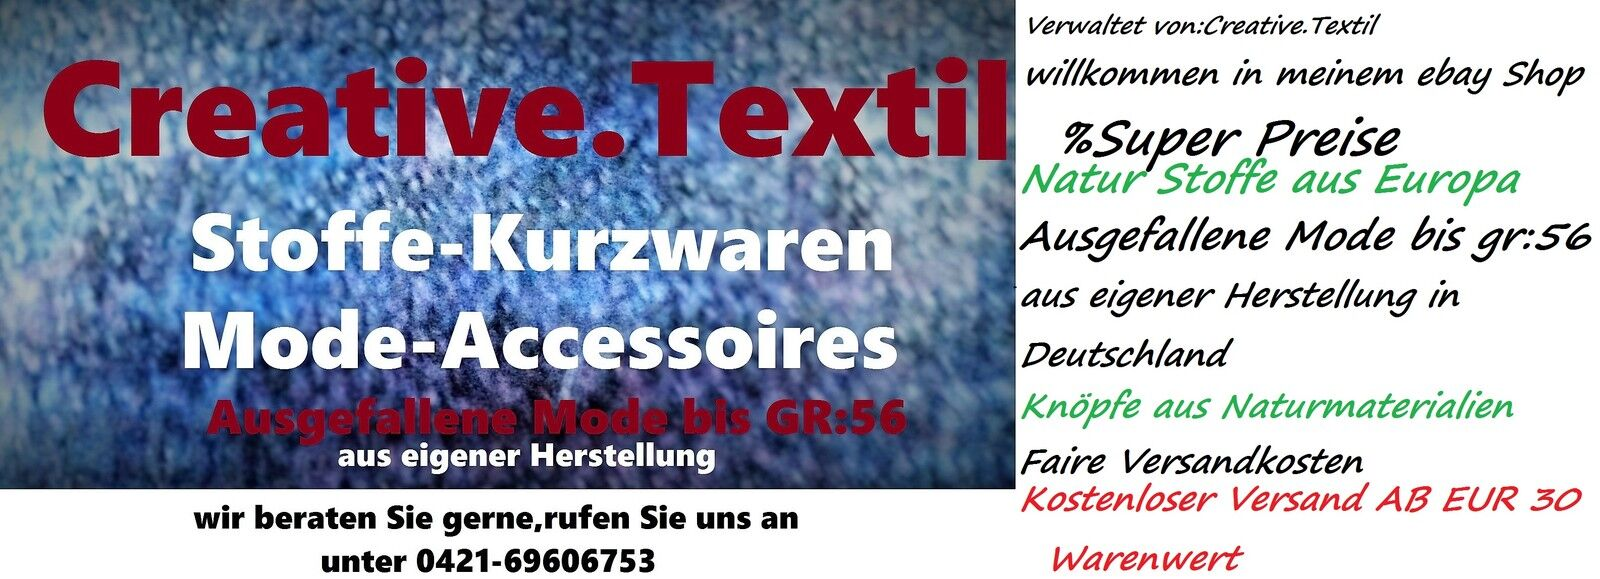 creative.textil